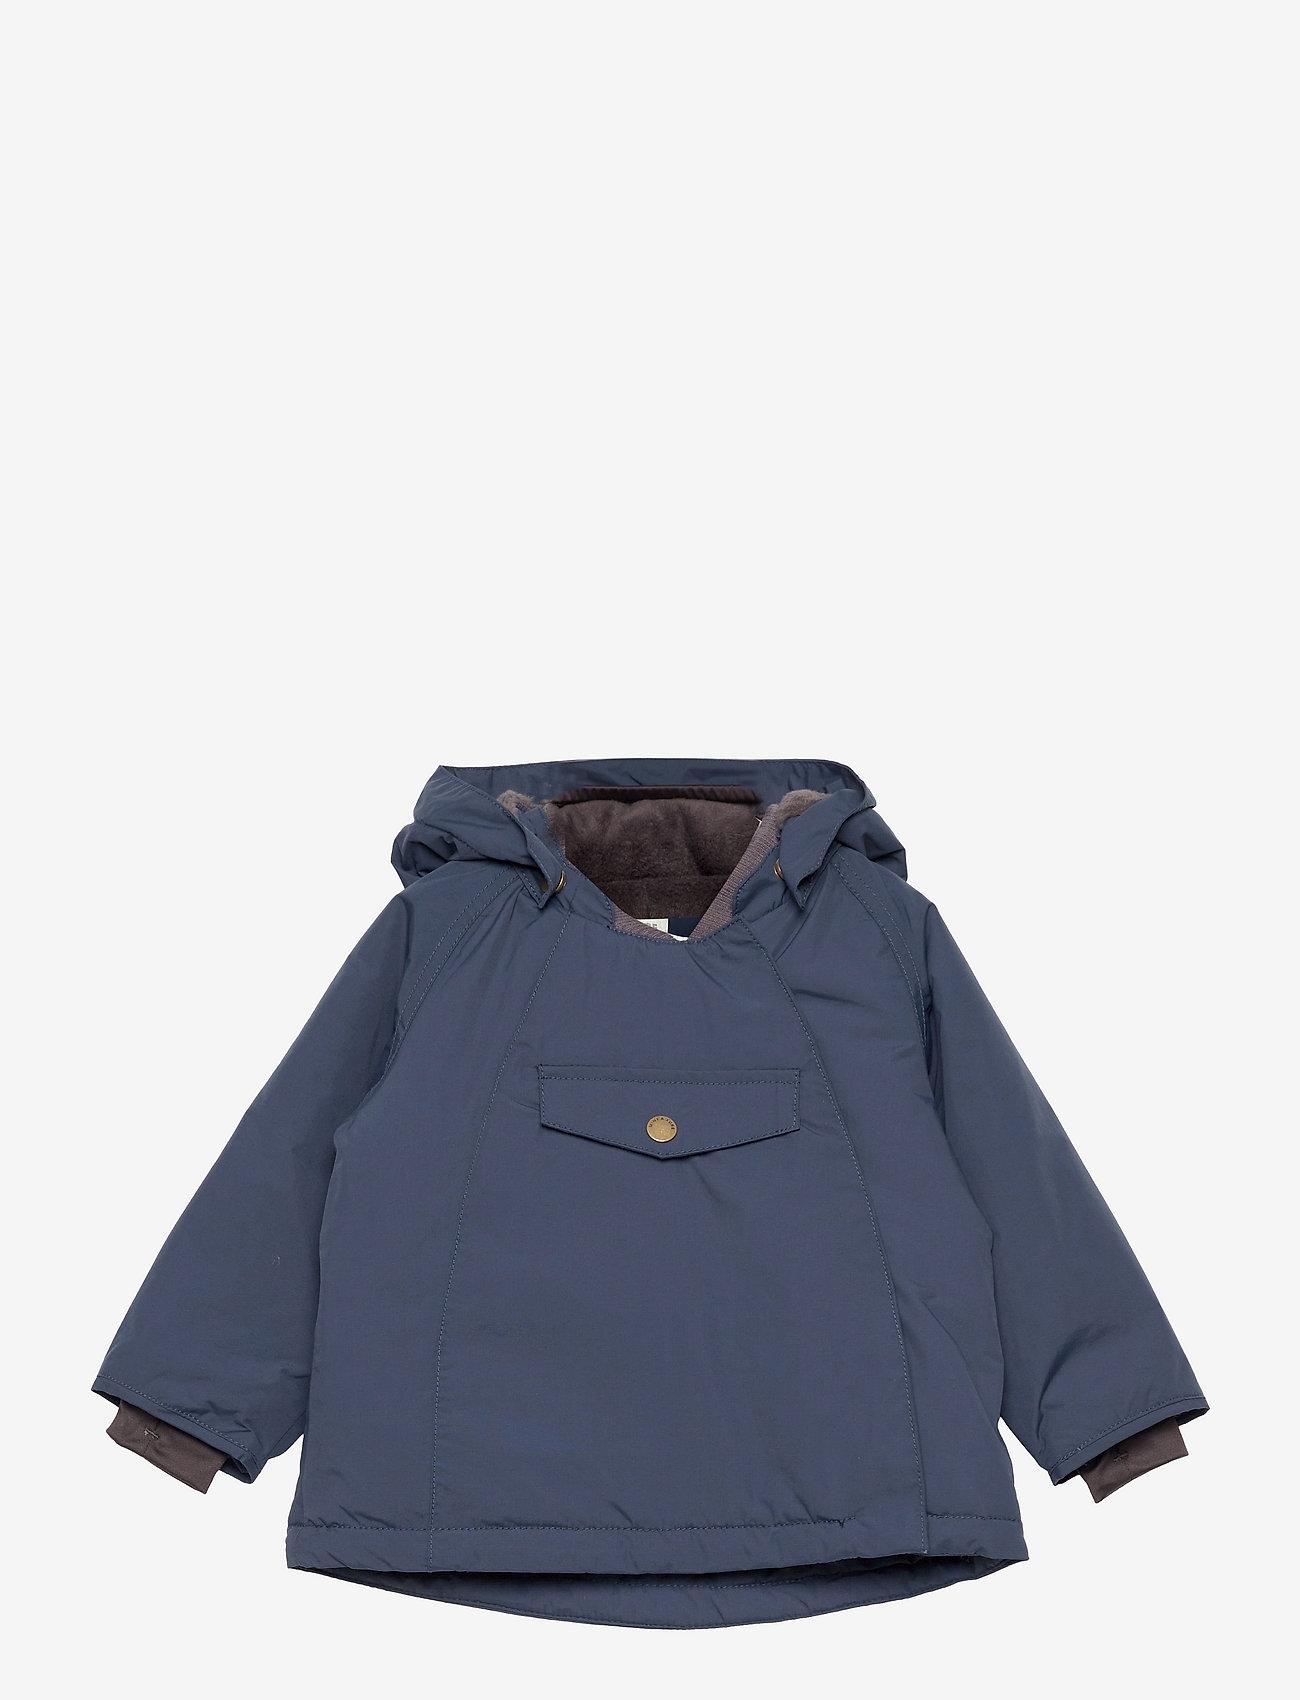 Mini A Ture - Wang Jacket, M - winter jacket - blue nights - 0